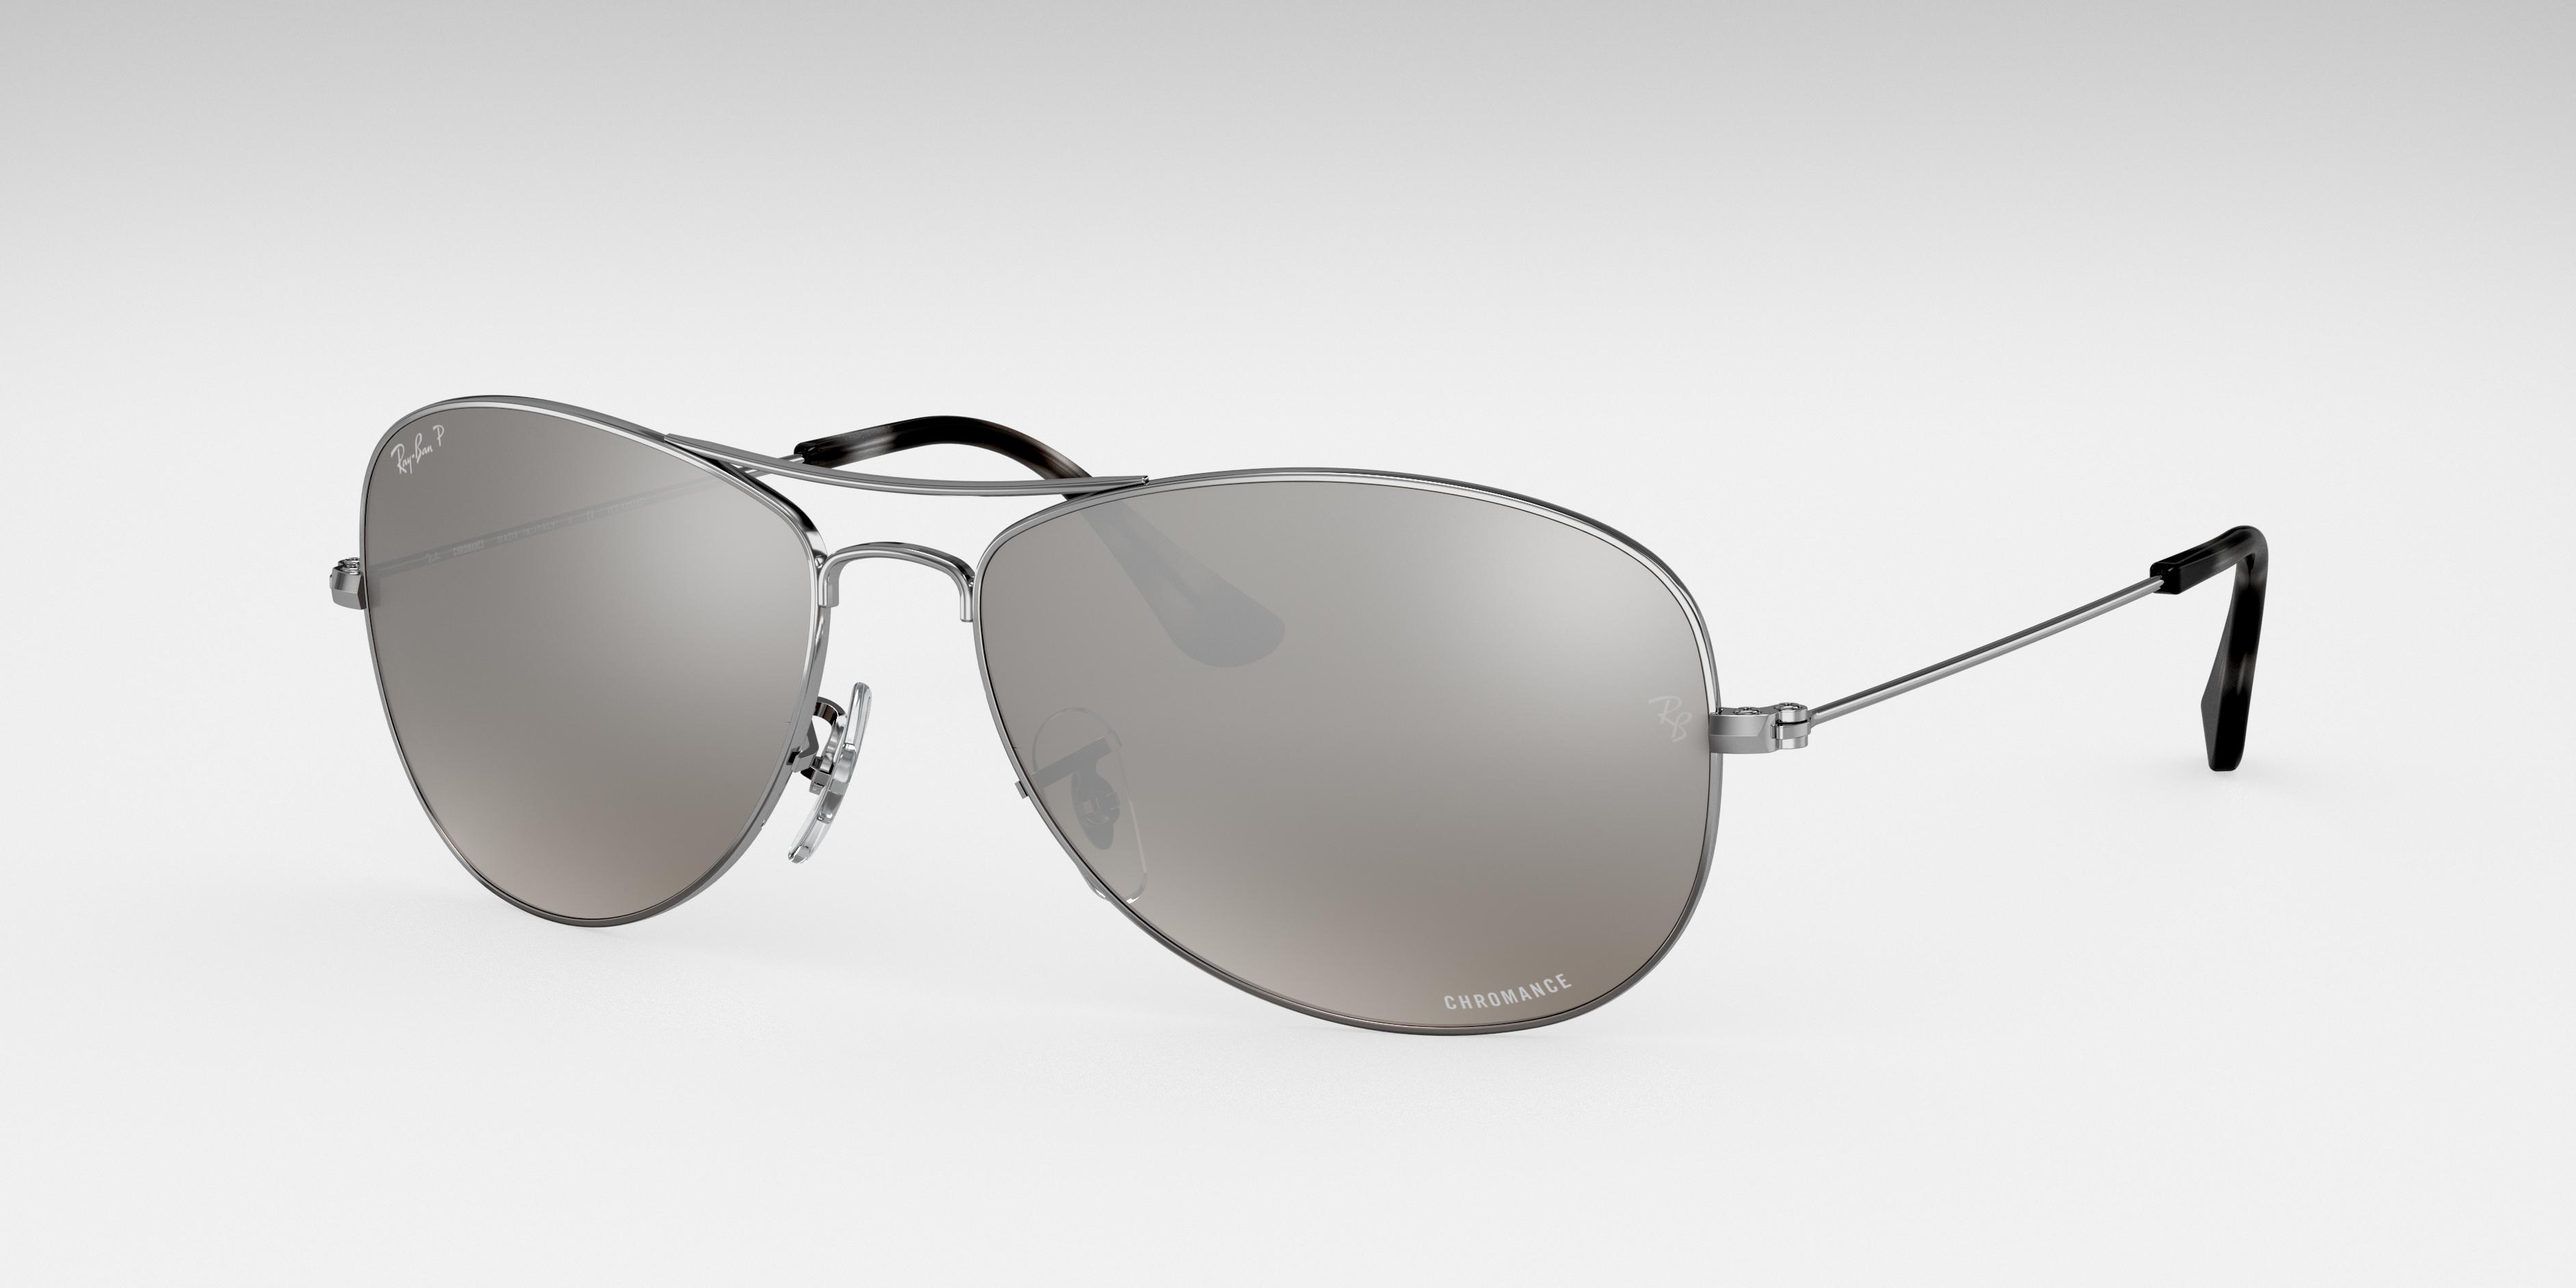 Ray-Ban Rb3562 Chromance Silver, Polarized Gray Lenses - RB3562